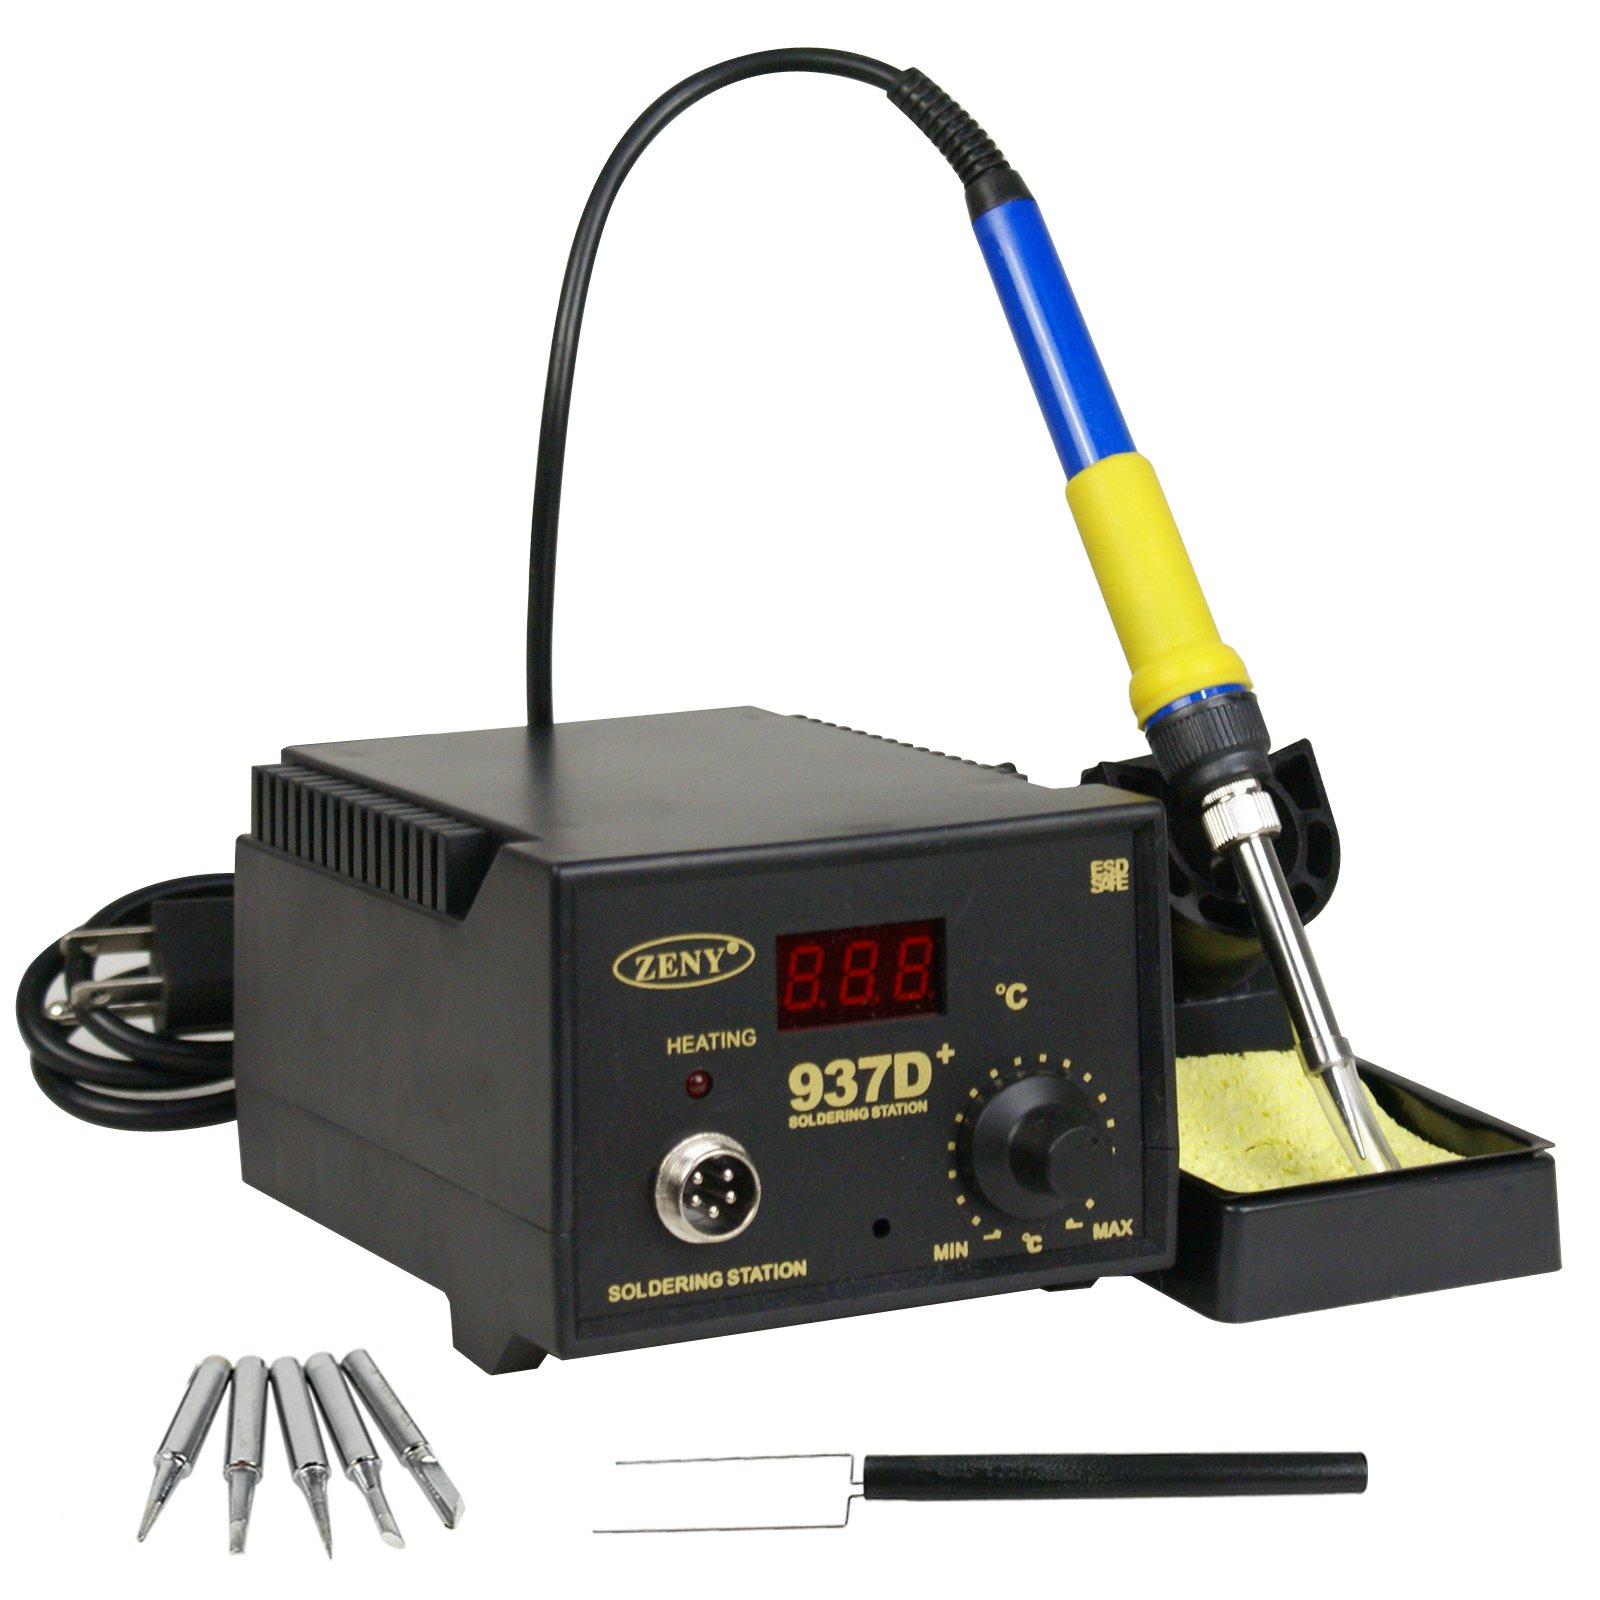 ZENY 937D+ SMD Soldering Hot Iron Station Digital Adjustable w/ 5 Tips & Japan Heater